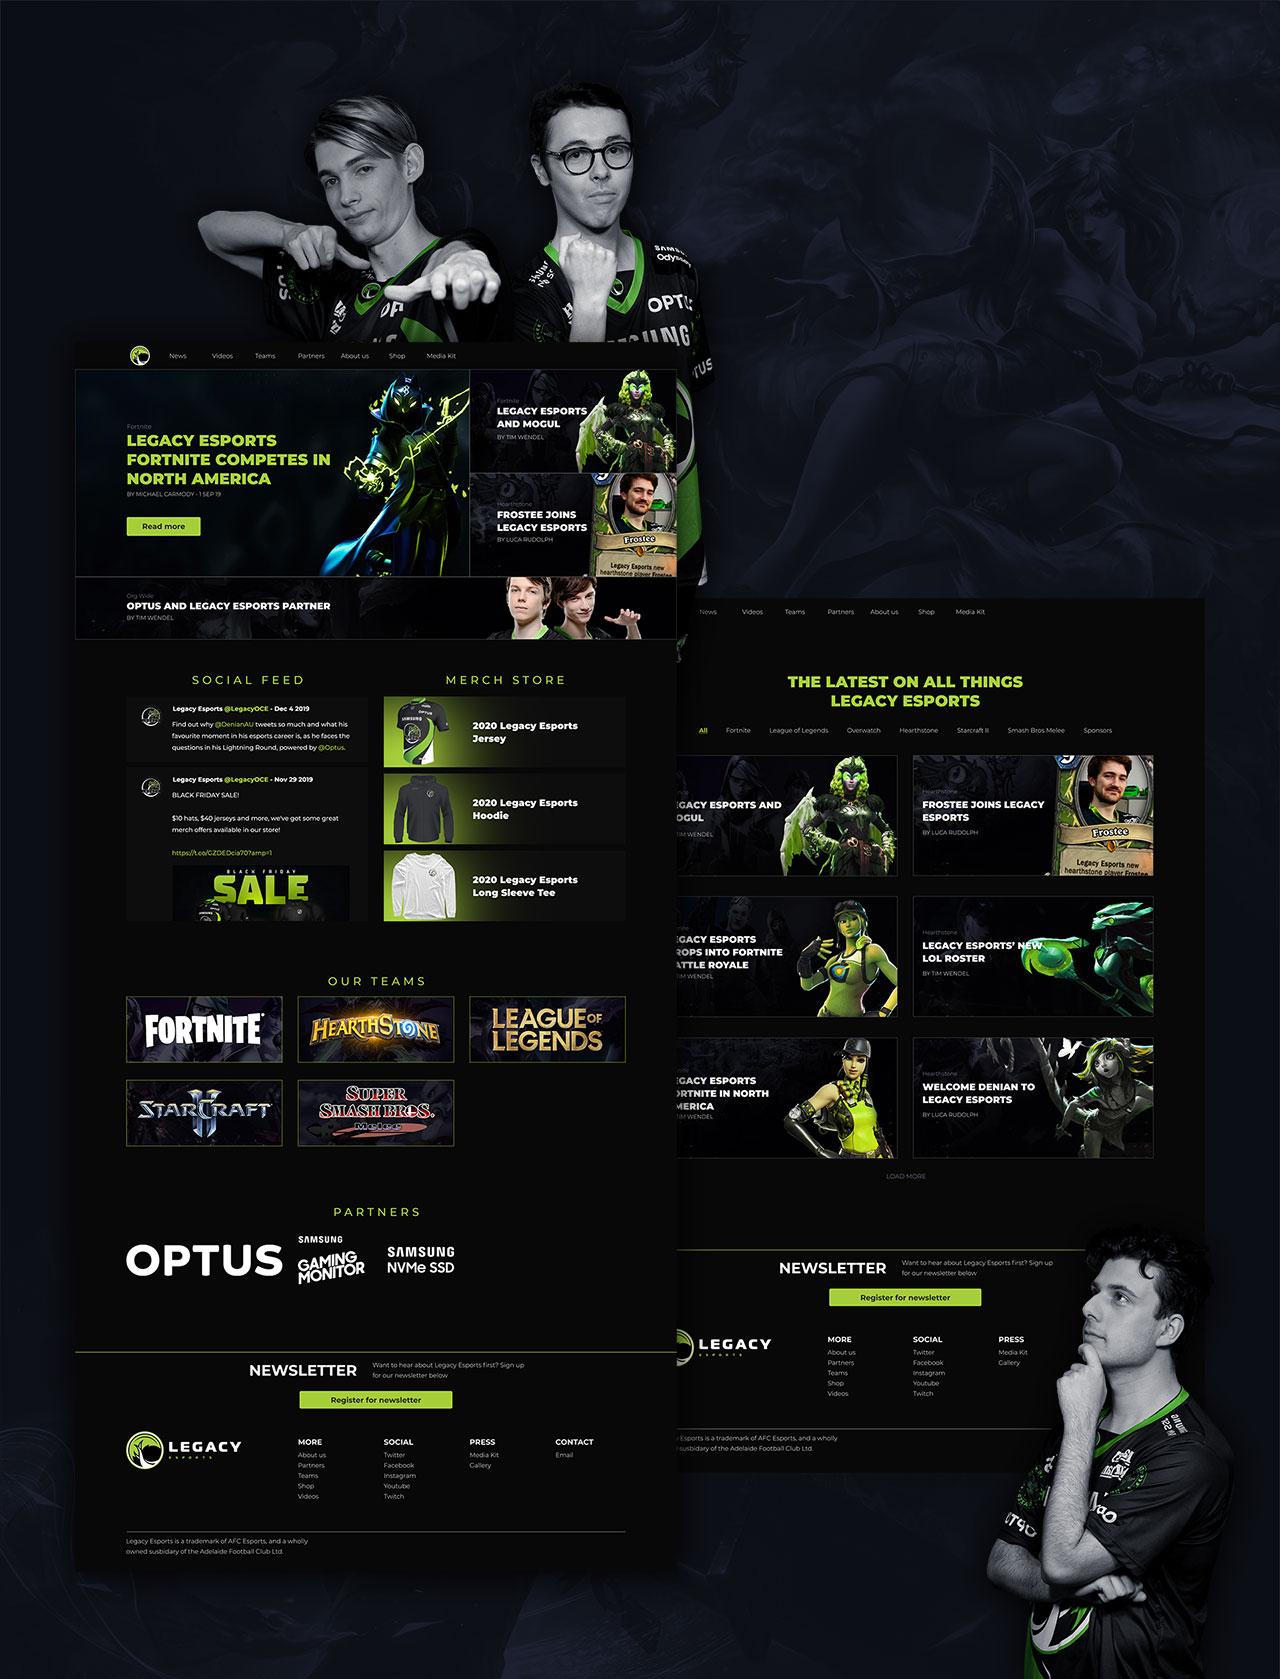 Legacy Esports website show off